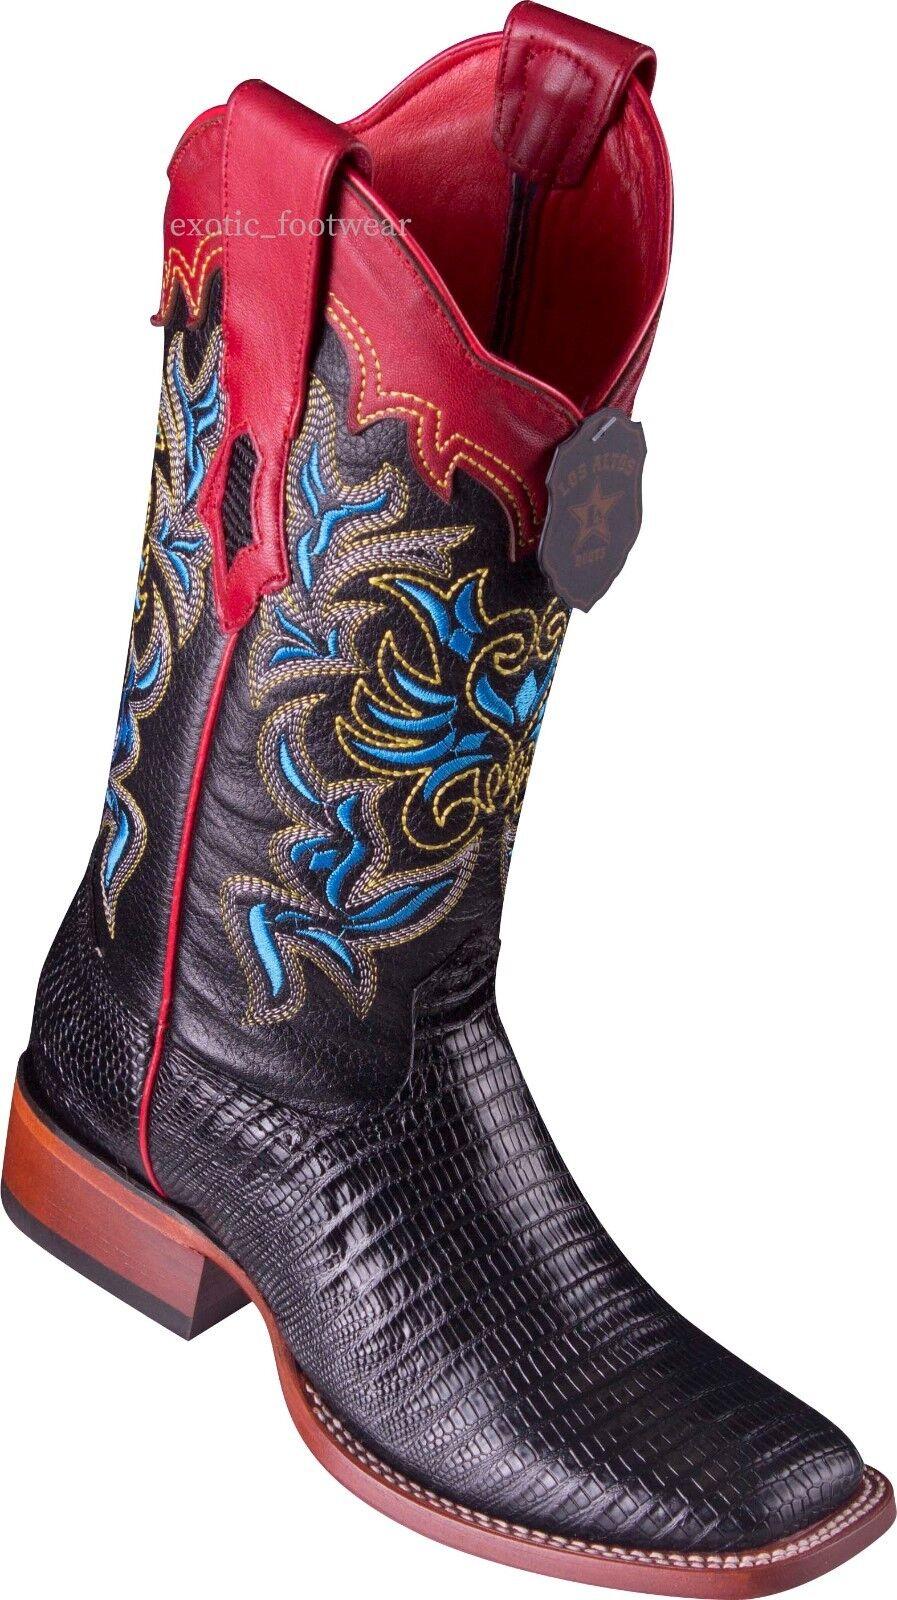 Ultimo 2018 Donna  Los Altos Genuine Teju Lizard Western stivali stivali stivali Square Toe Handmade Medium  più preferenziale